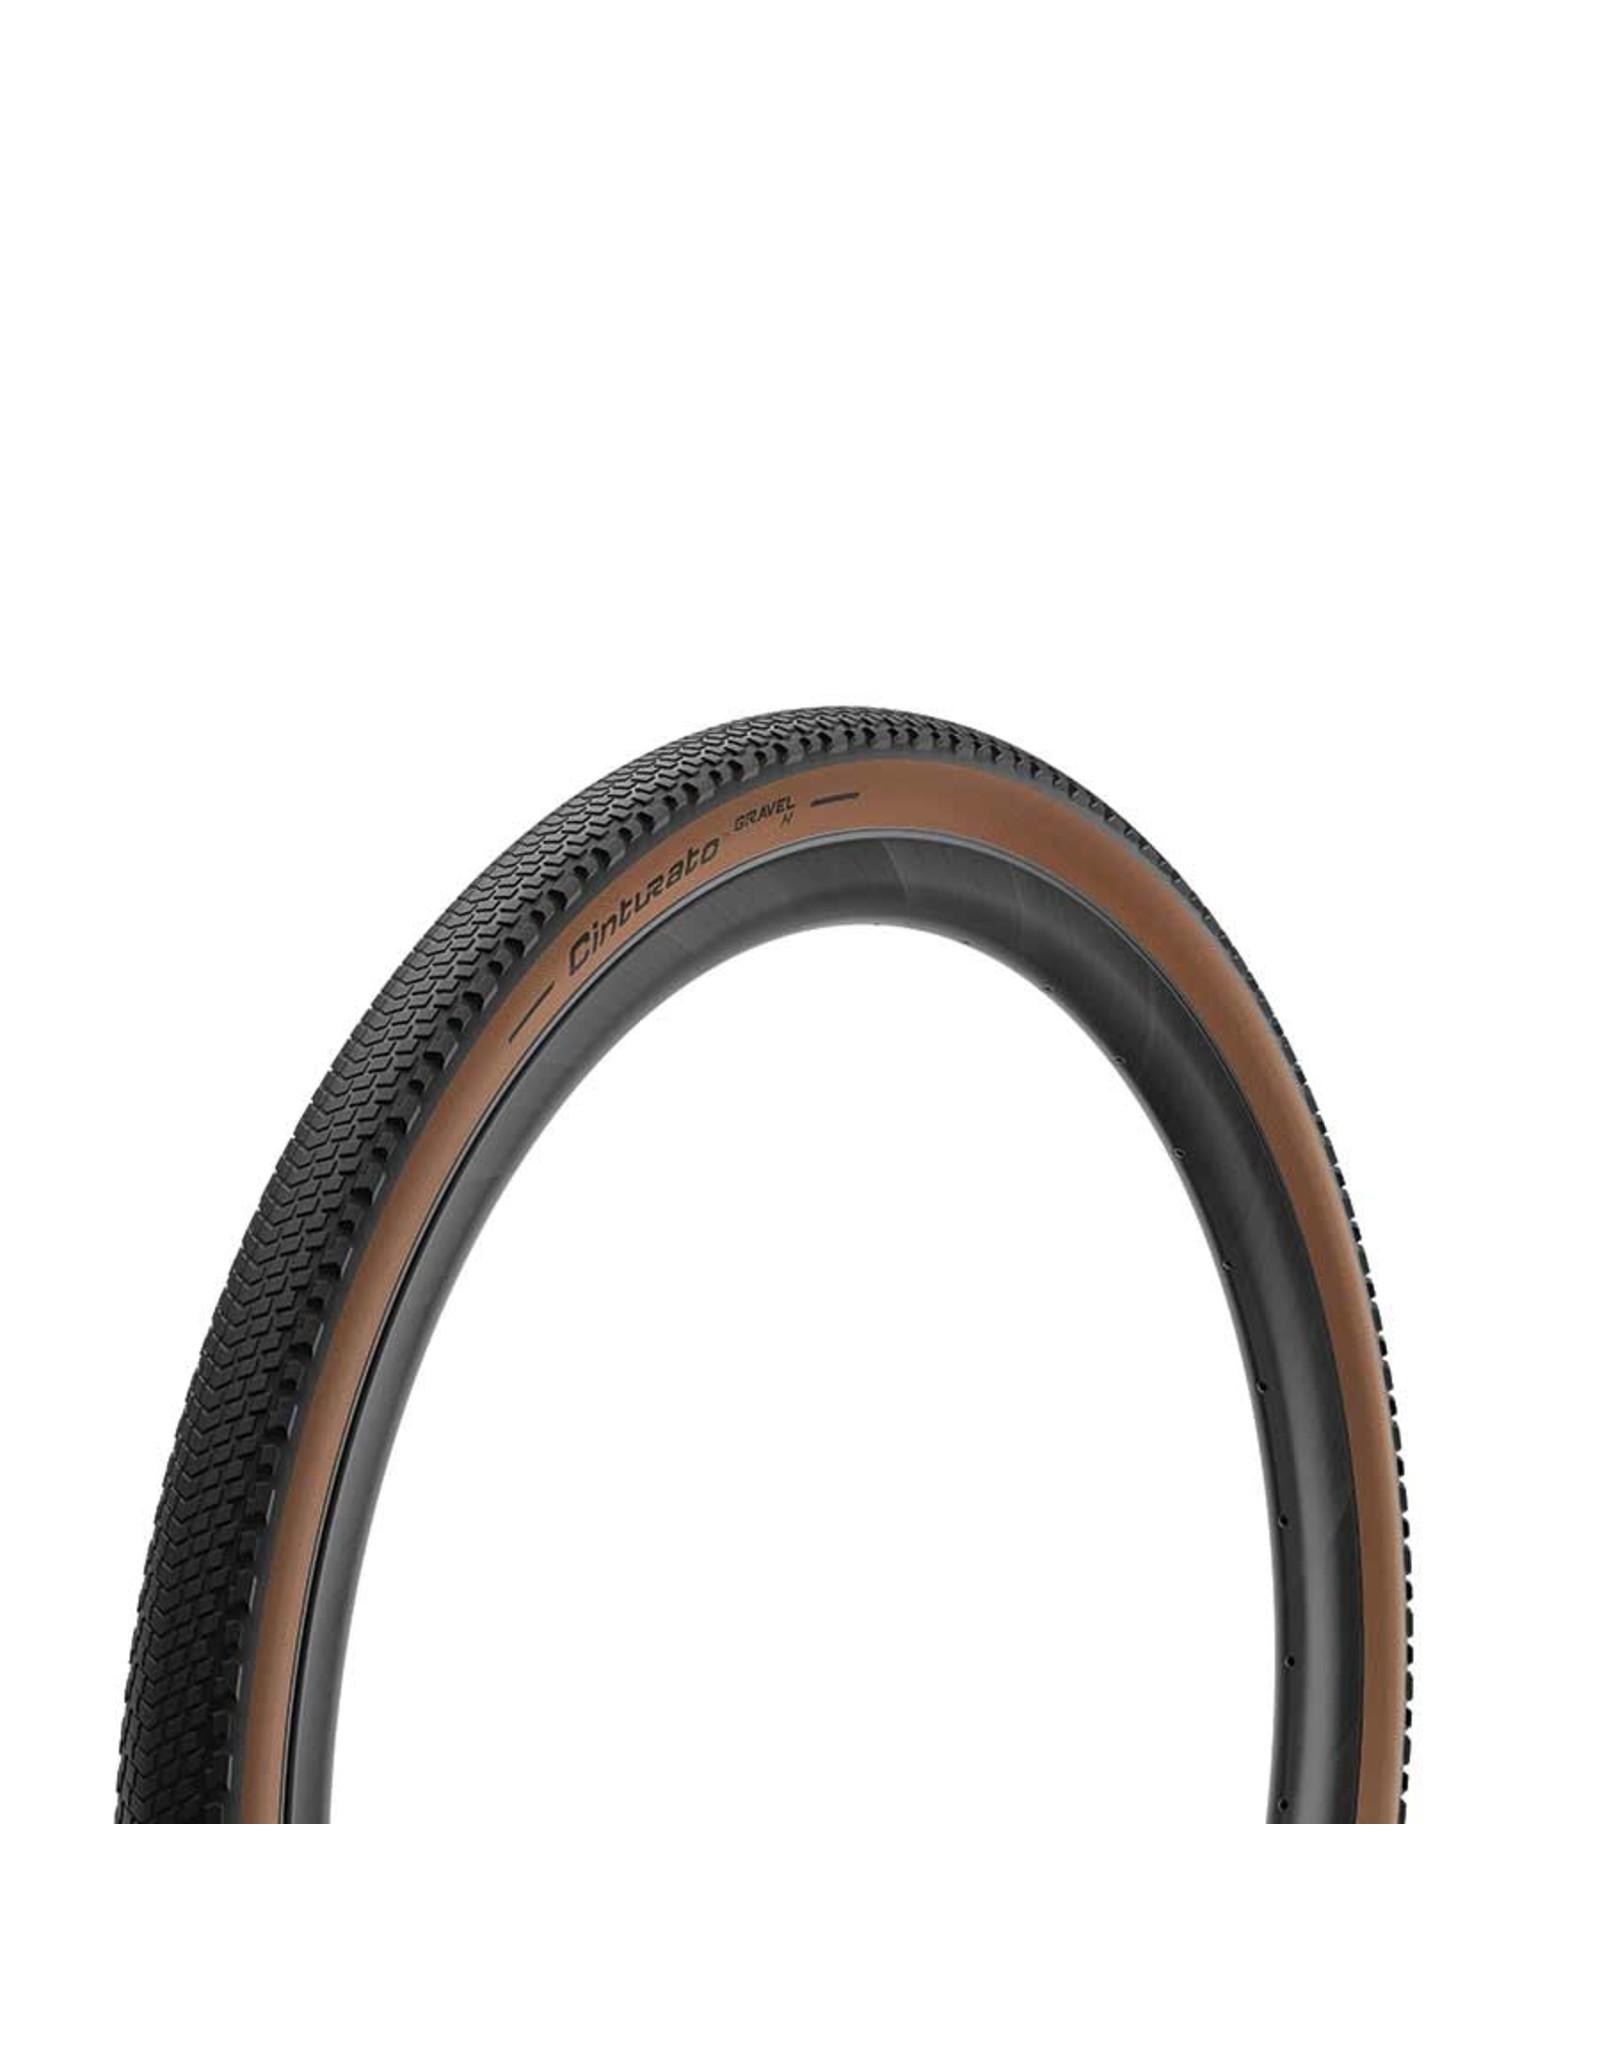 Pirelli Pirelli, Cinturato Gravel H, Tire, 700x40C, Folding, Tubeless Ready, SpeedGrip, 127TPI, Beige